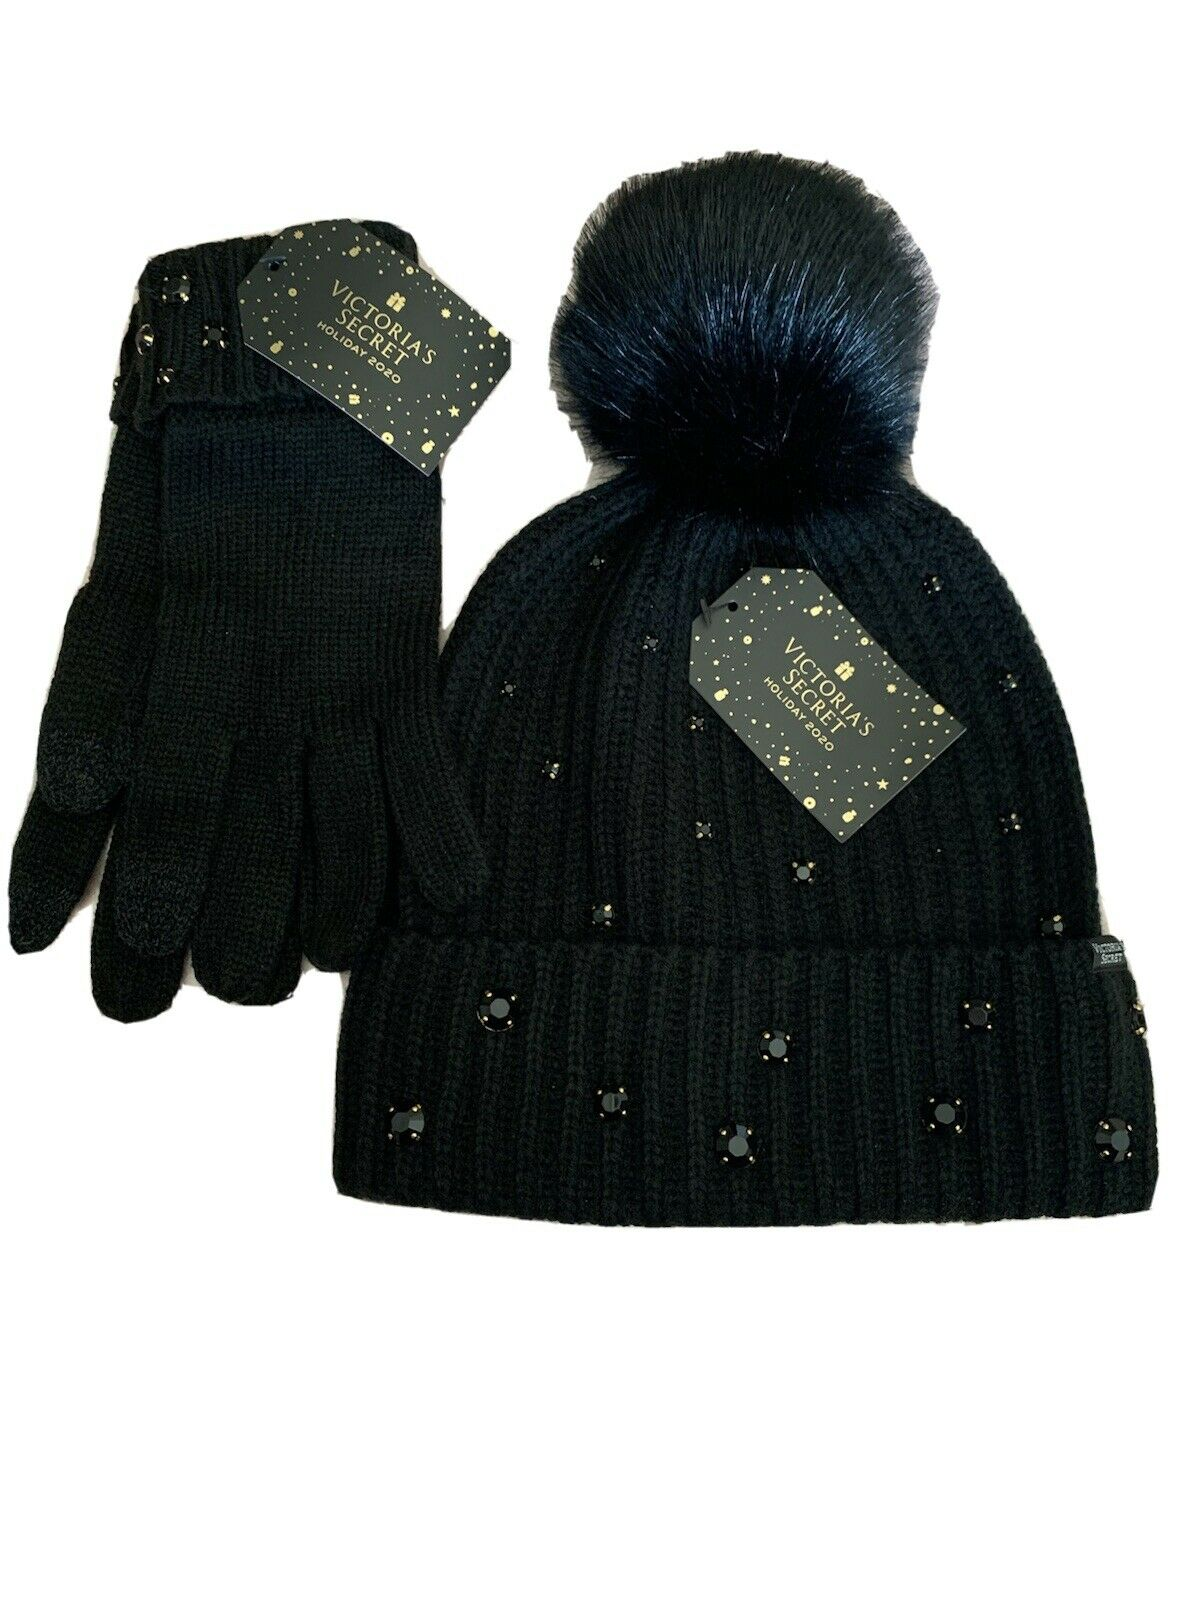 Victoria Secrets Black 2020 Pom-Pom Hat & Glove Set NEW